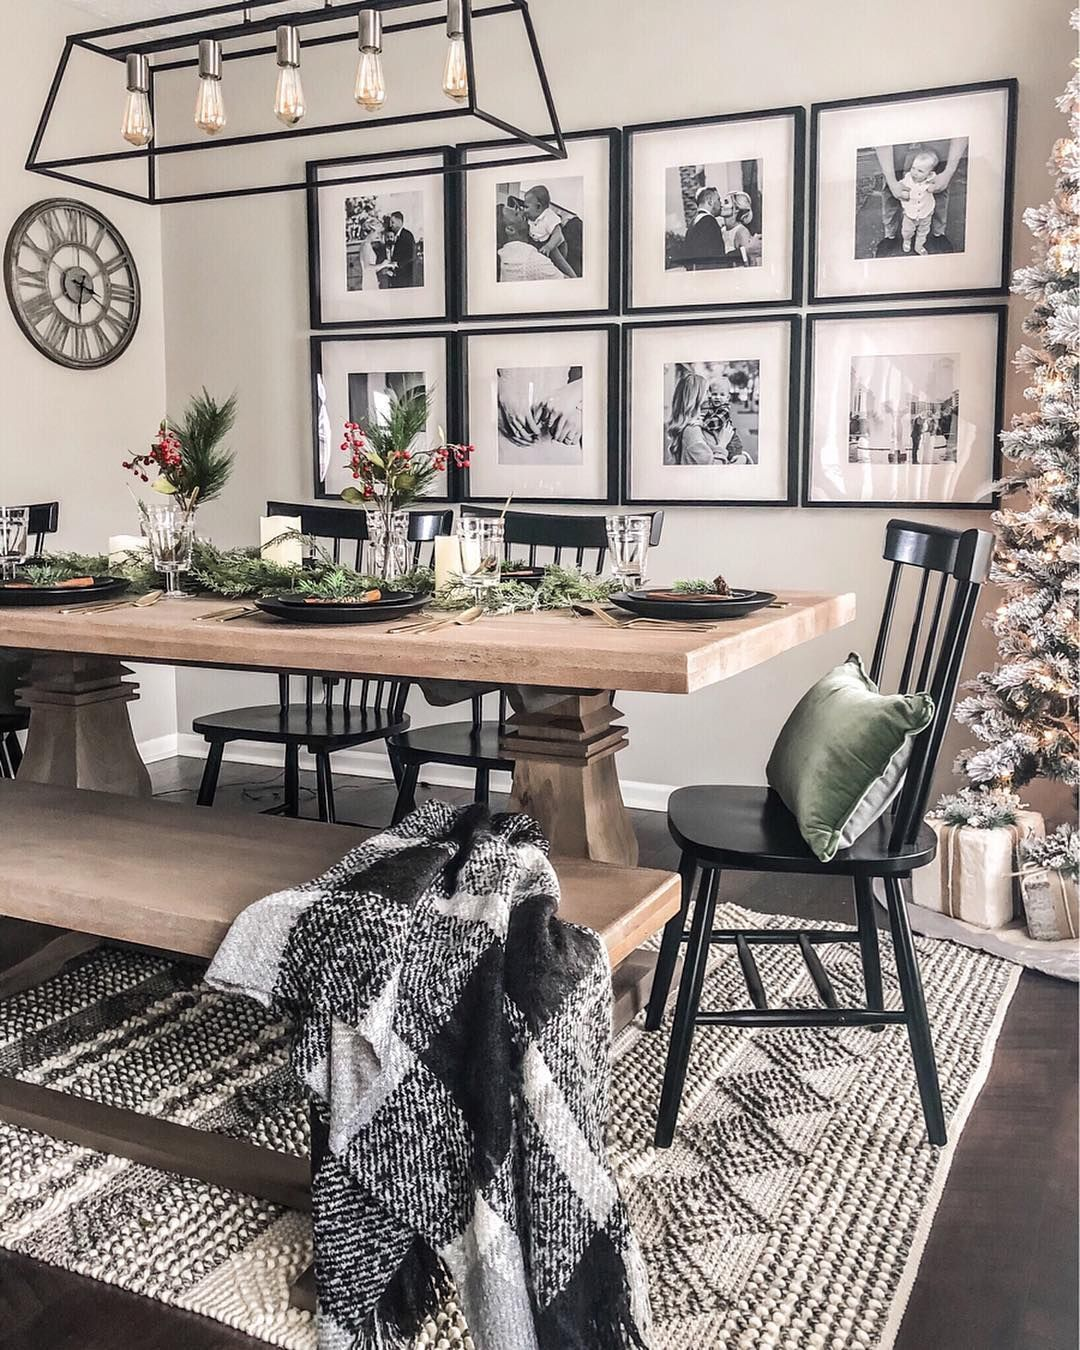 29+ Best Dining Room Wall Decor Ideas 2018 (Modern & Contemporary) – pickndecor.com/design - Haus Dekoration